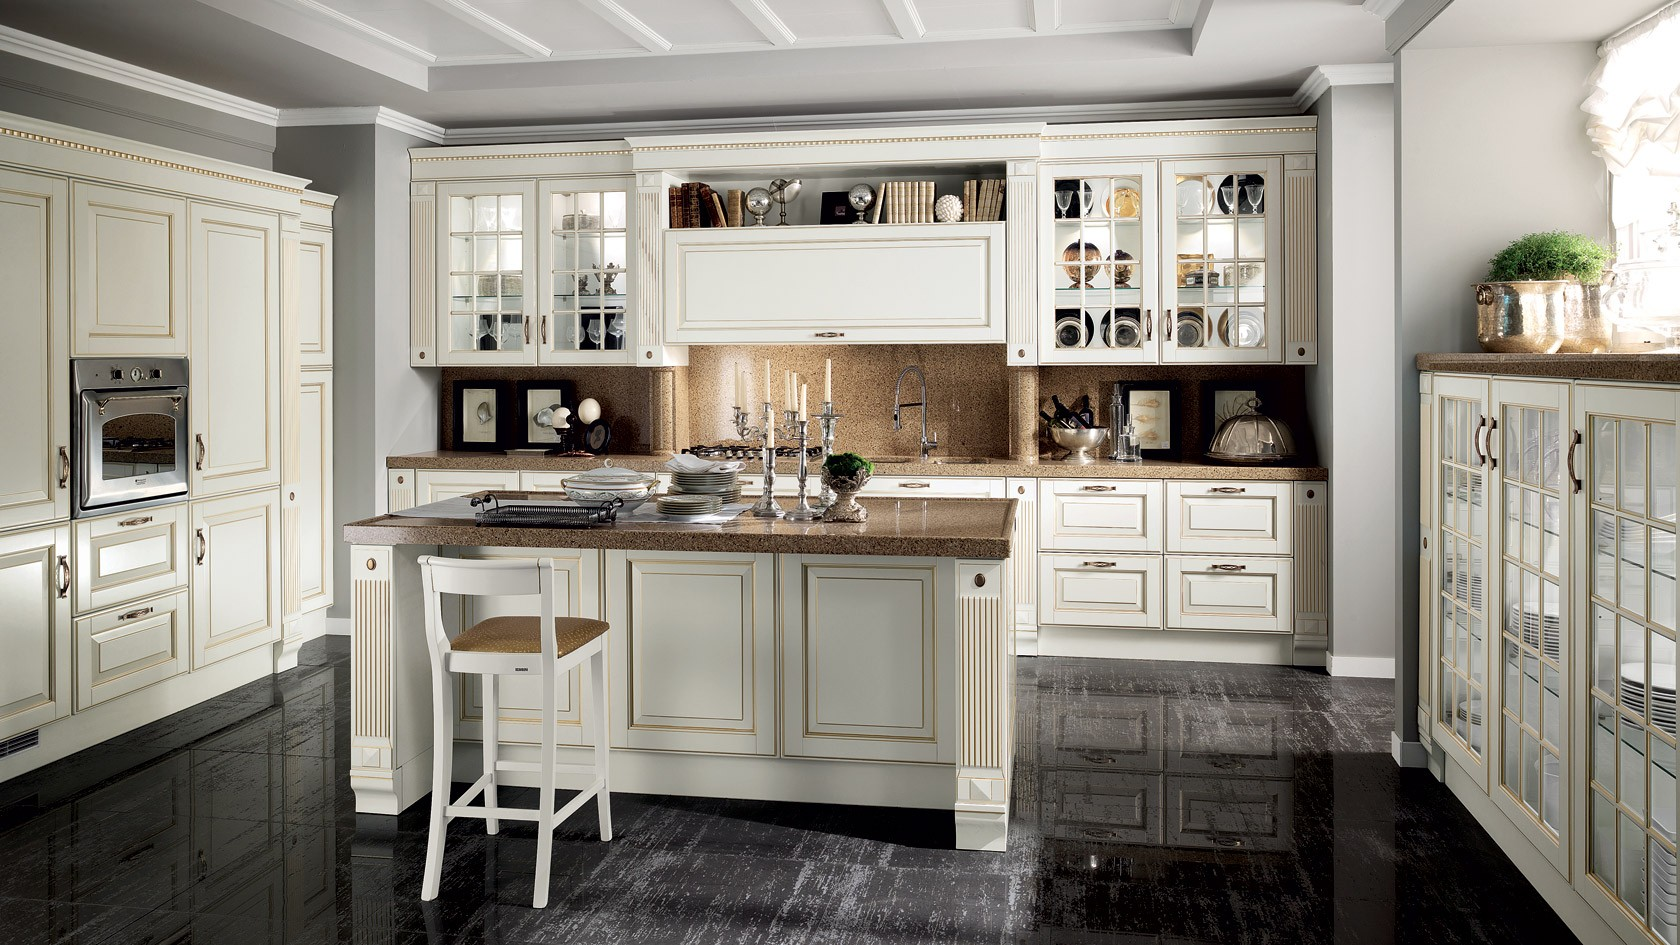 Cucina Classica Scavolini Baltimora-Mobili Incardone